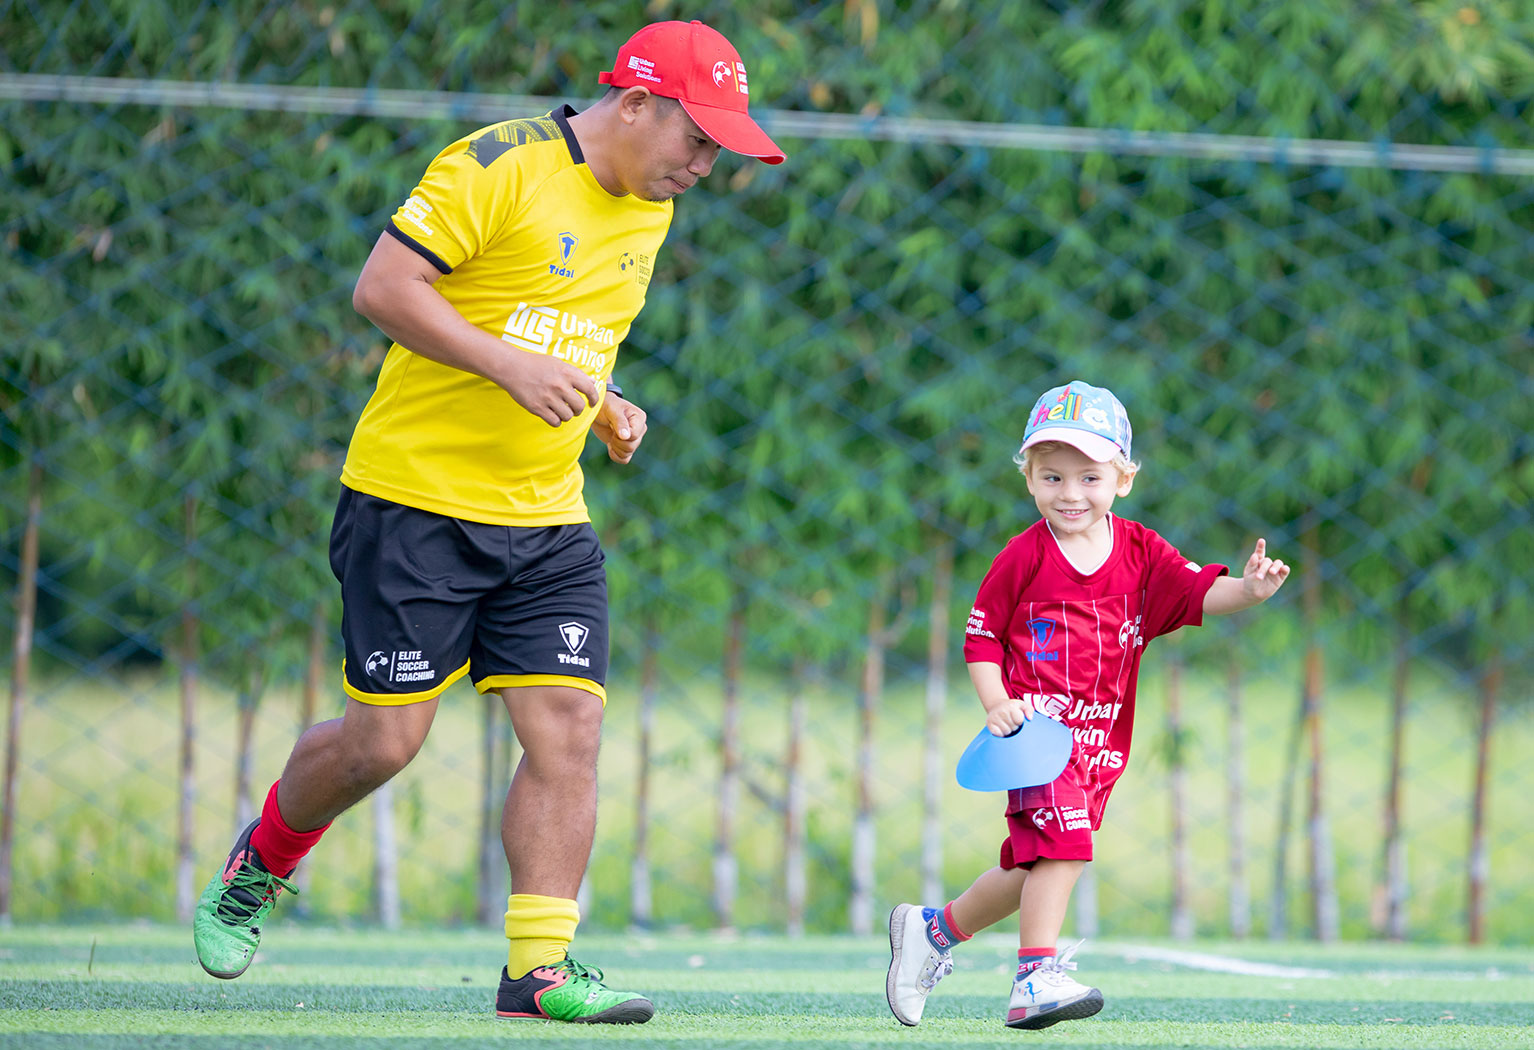 elite-soccer-coaching-football-school-cambodia-mini-kickers-01